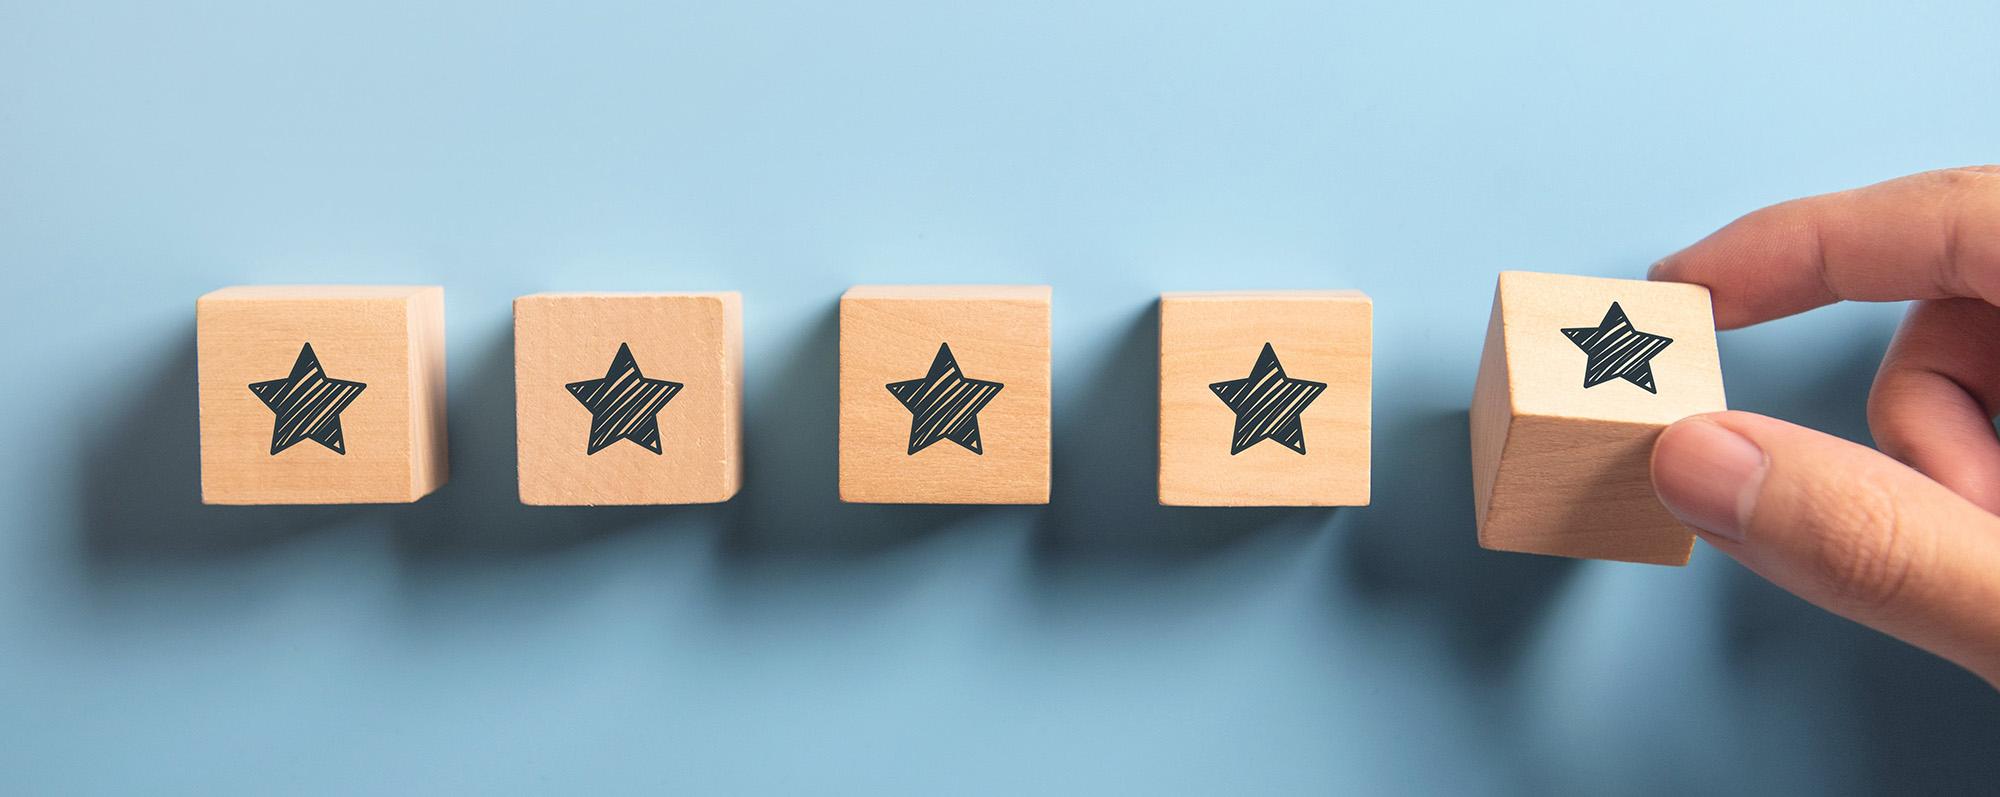 5 star review illustration